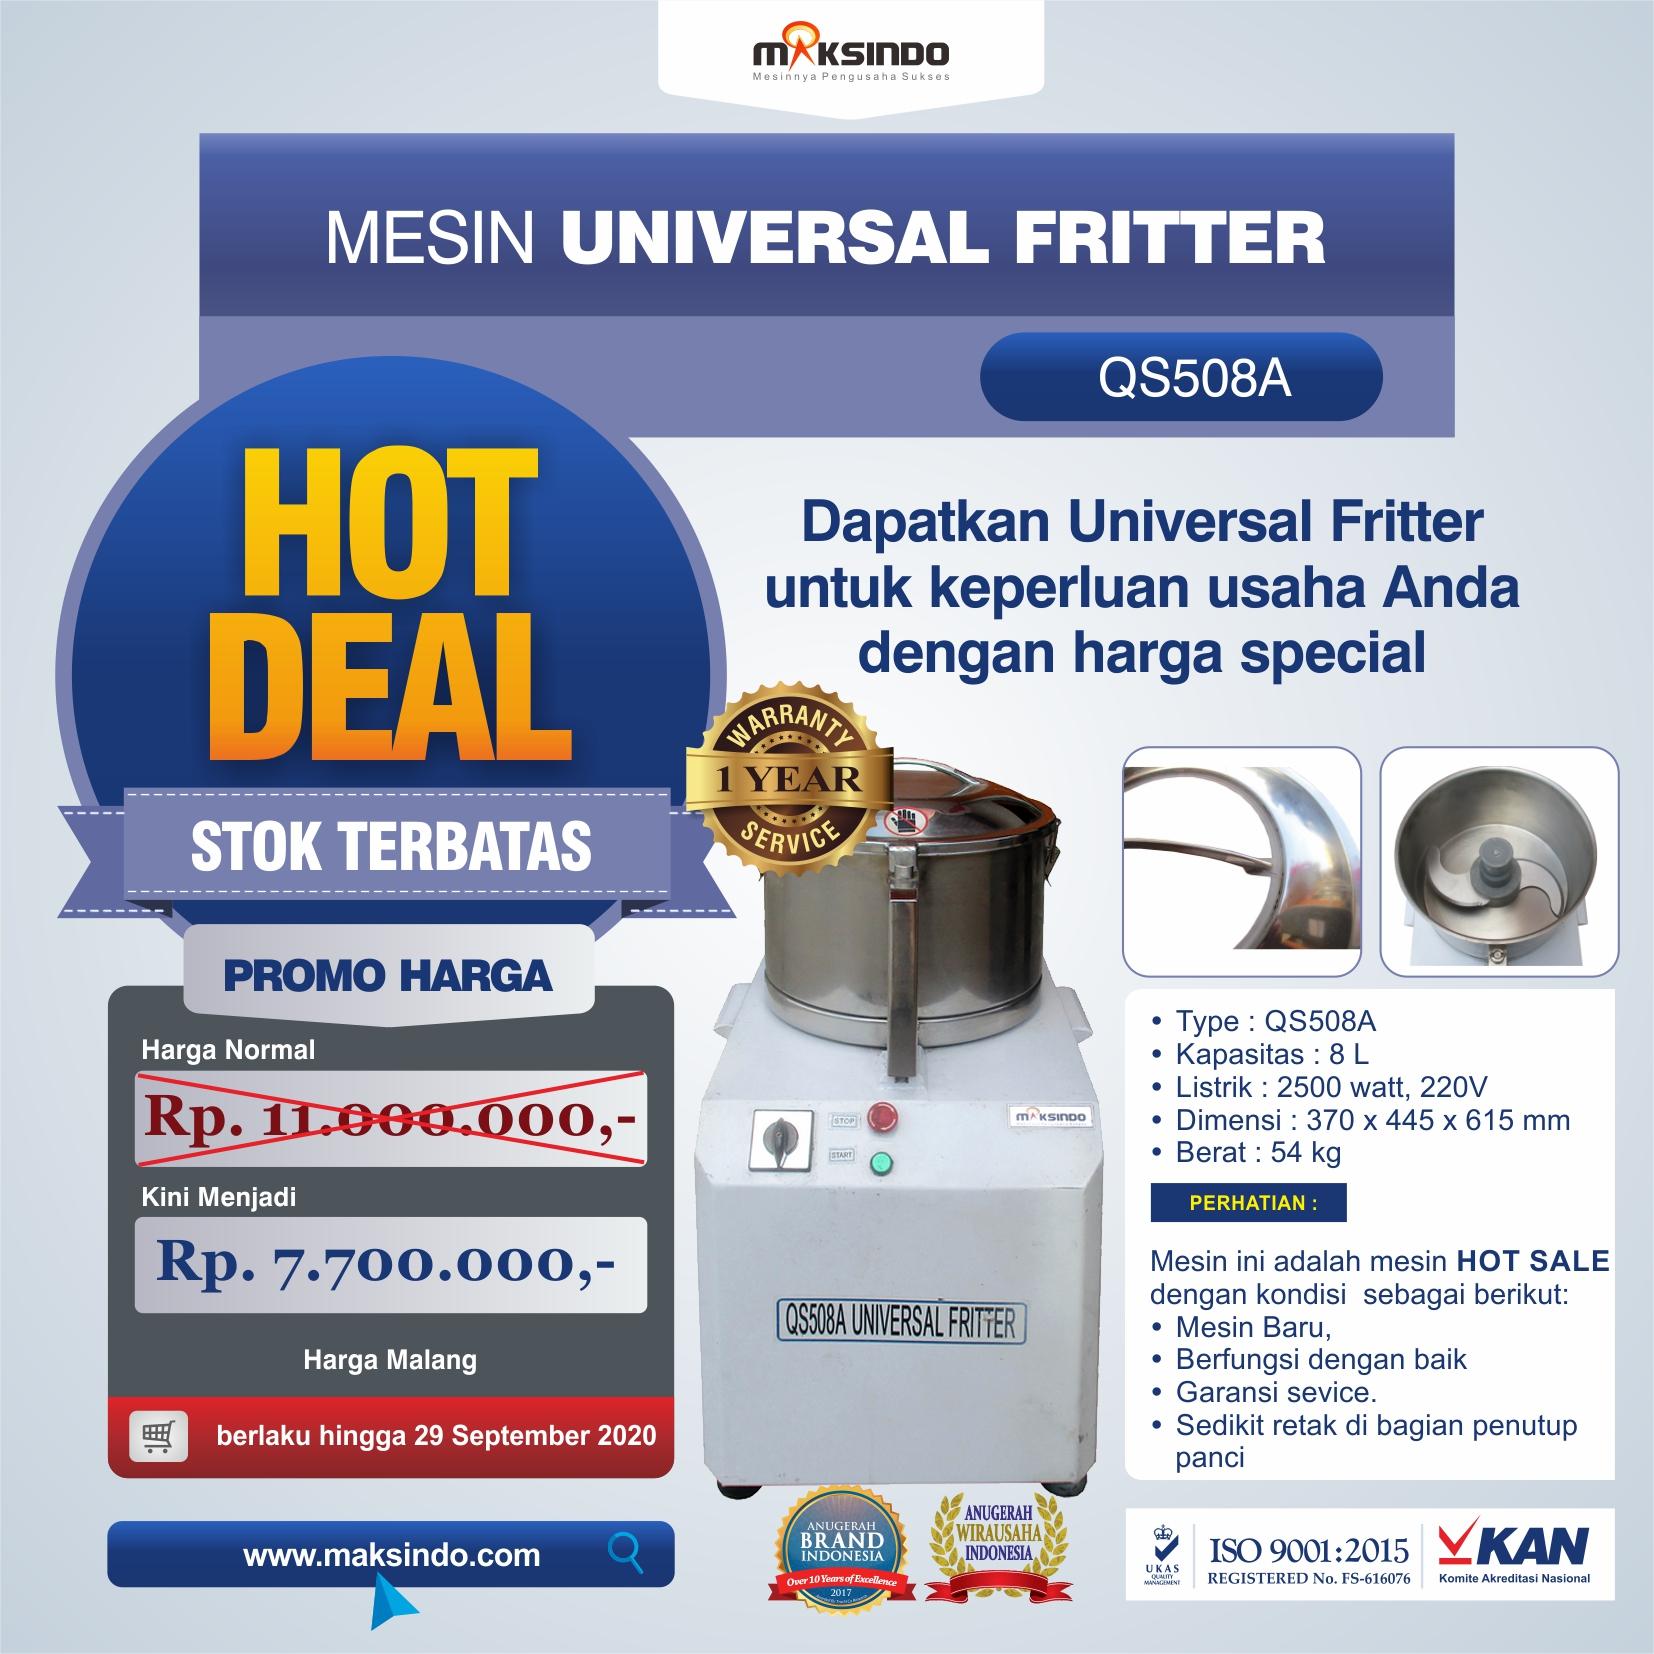 Jual Mesin Universal Fritter QS508A di Bekasi